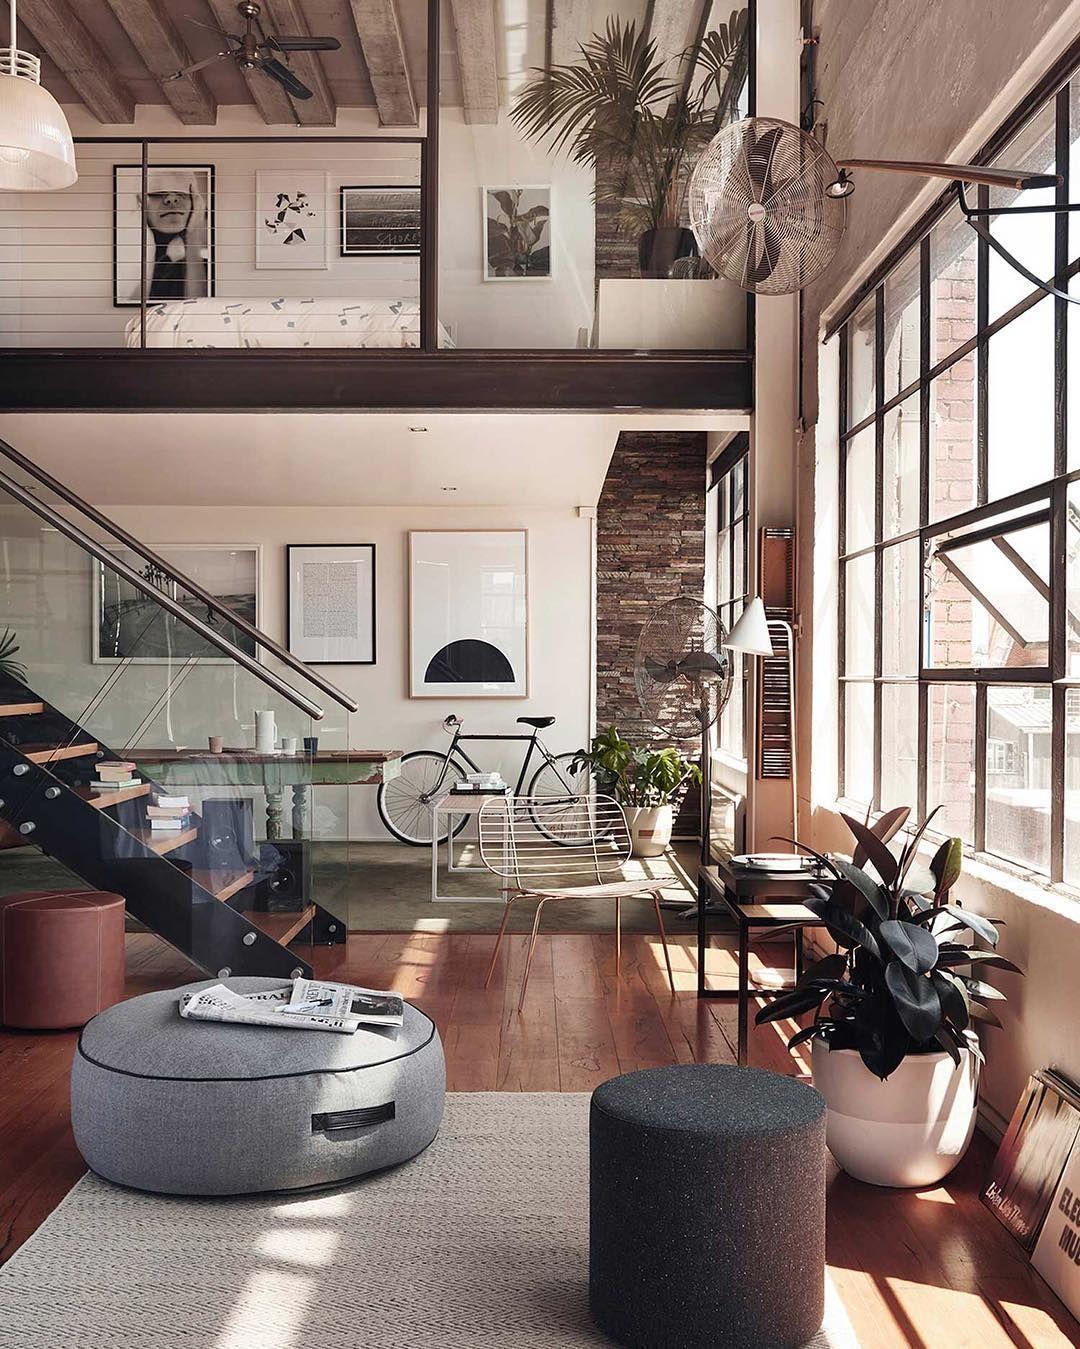 loft apartment tumblr decor ideas for the home pinte rh pinterest com